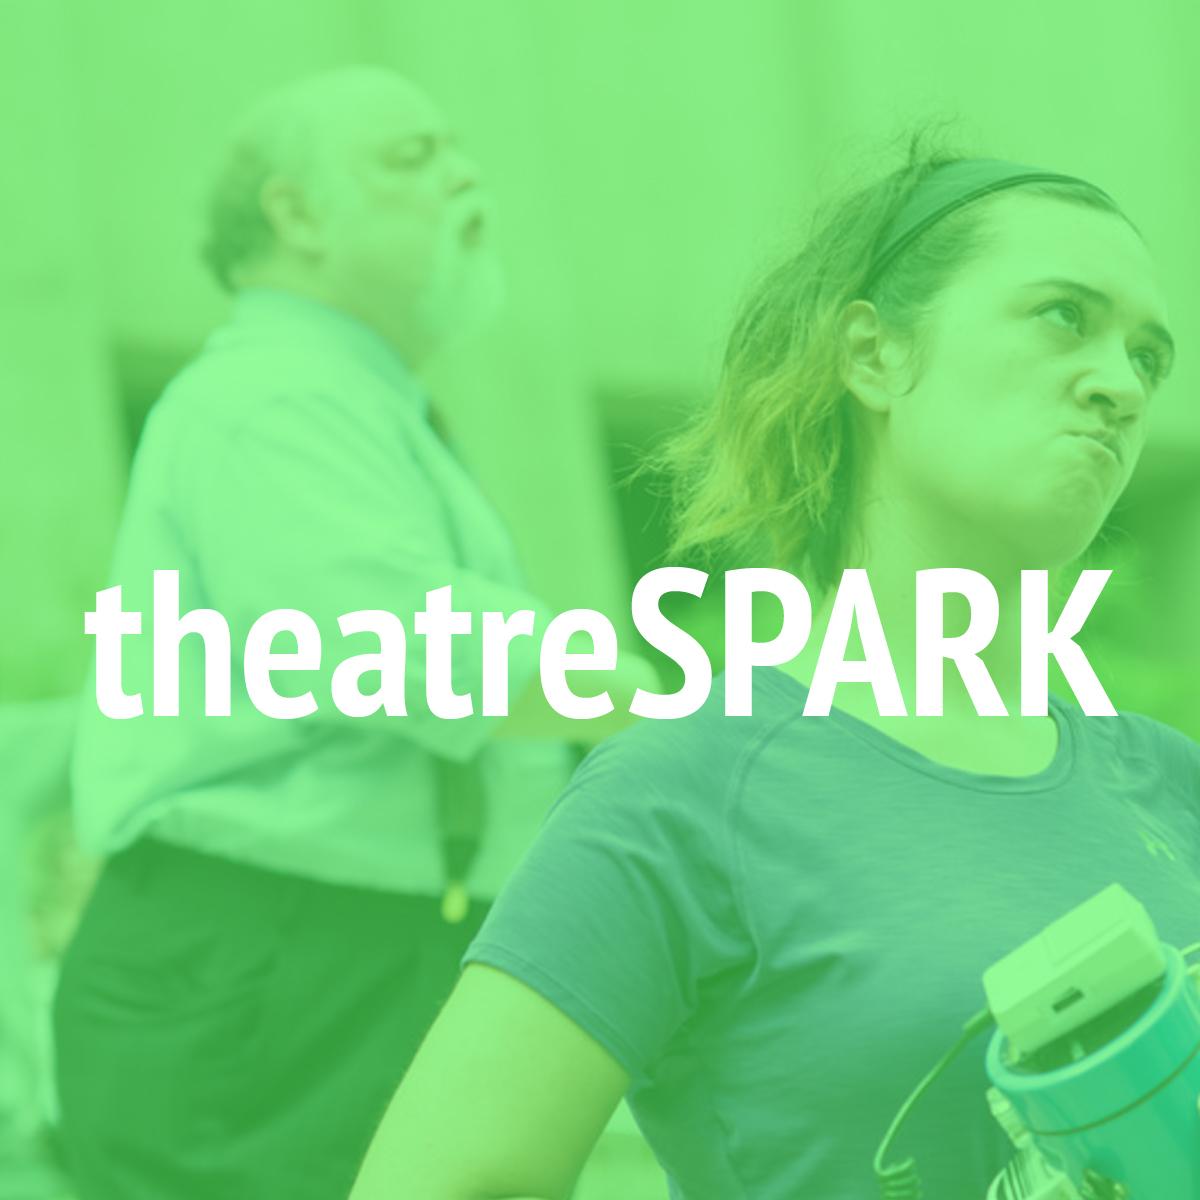 theatrespark.jpg